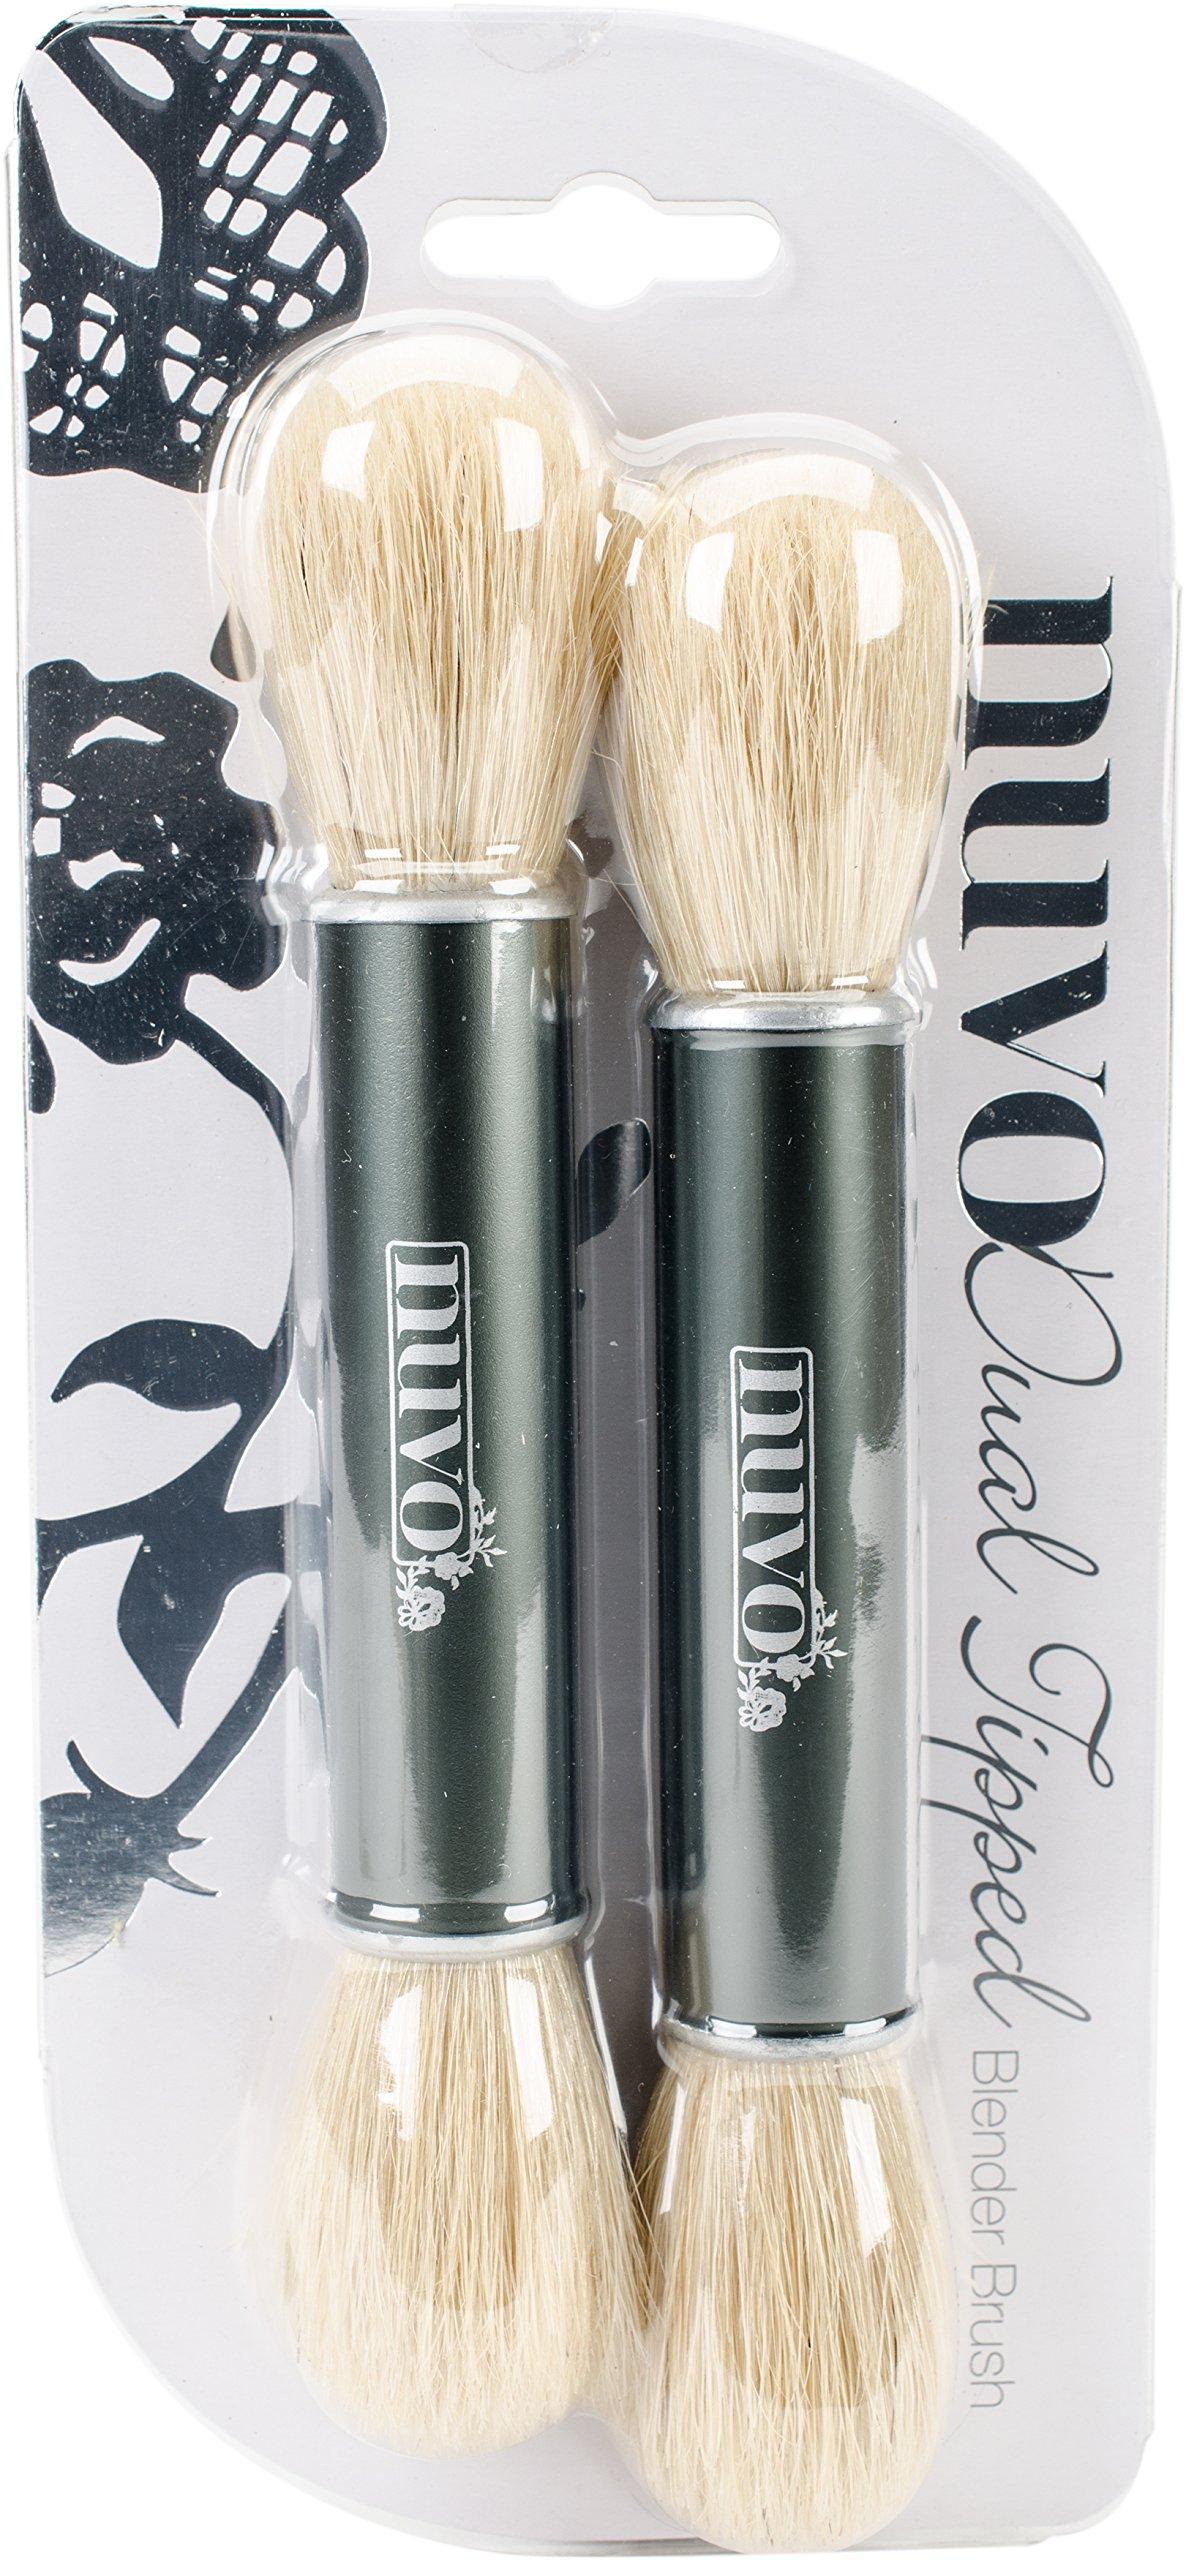 TONIC STUDIOS 979N Nuvo Duel Ended Blender Brush